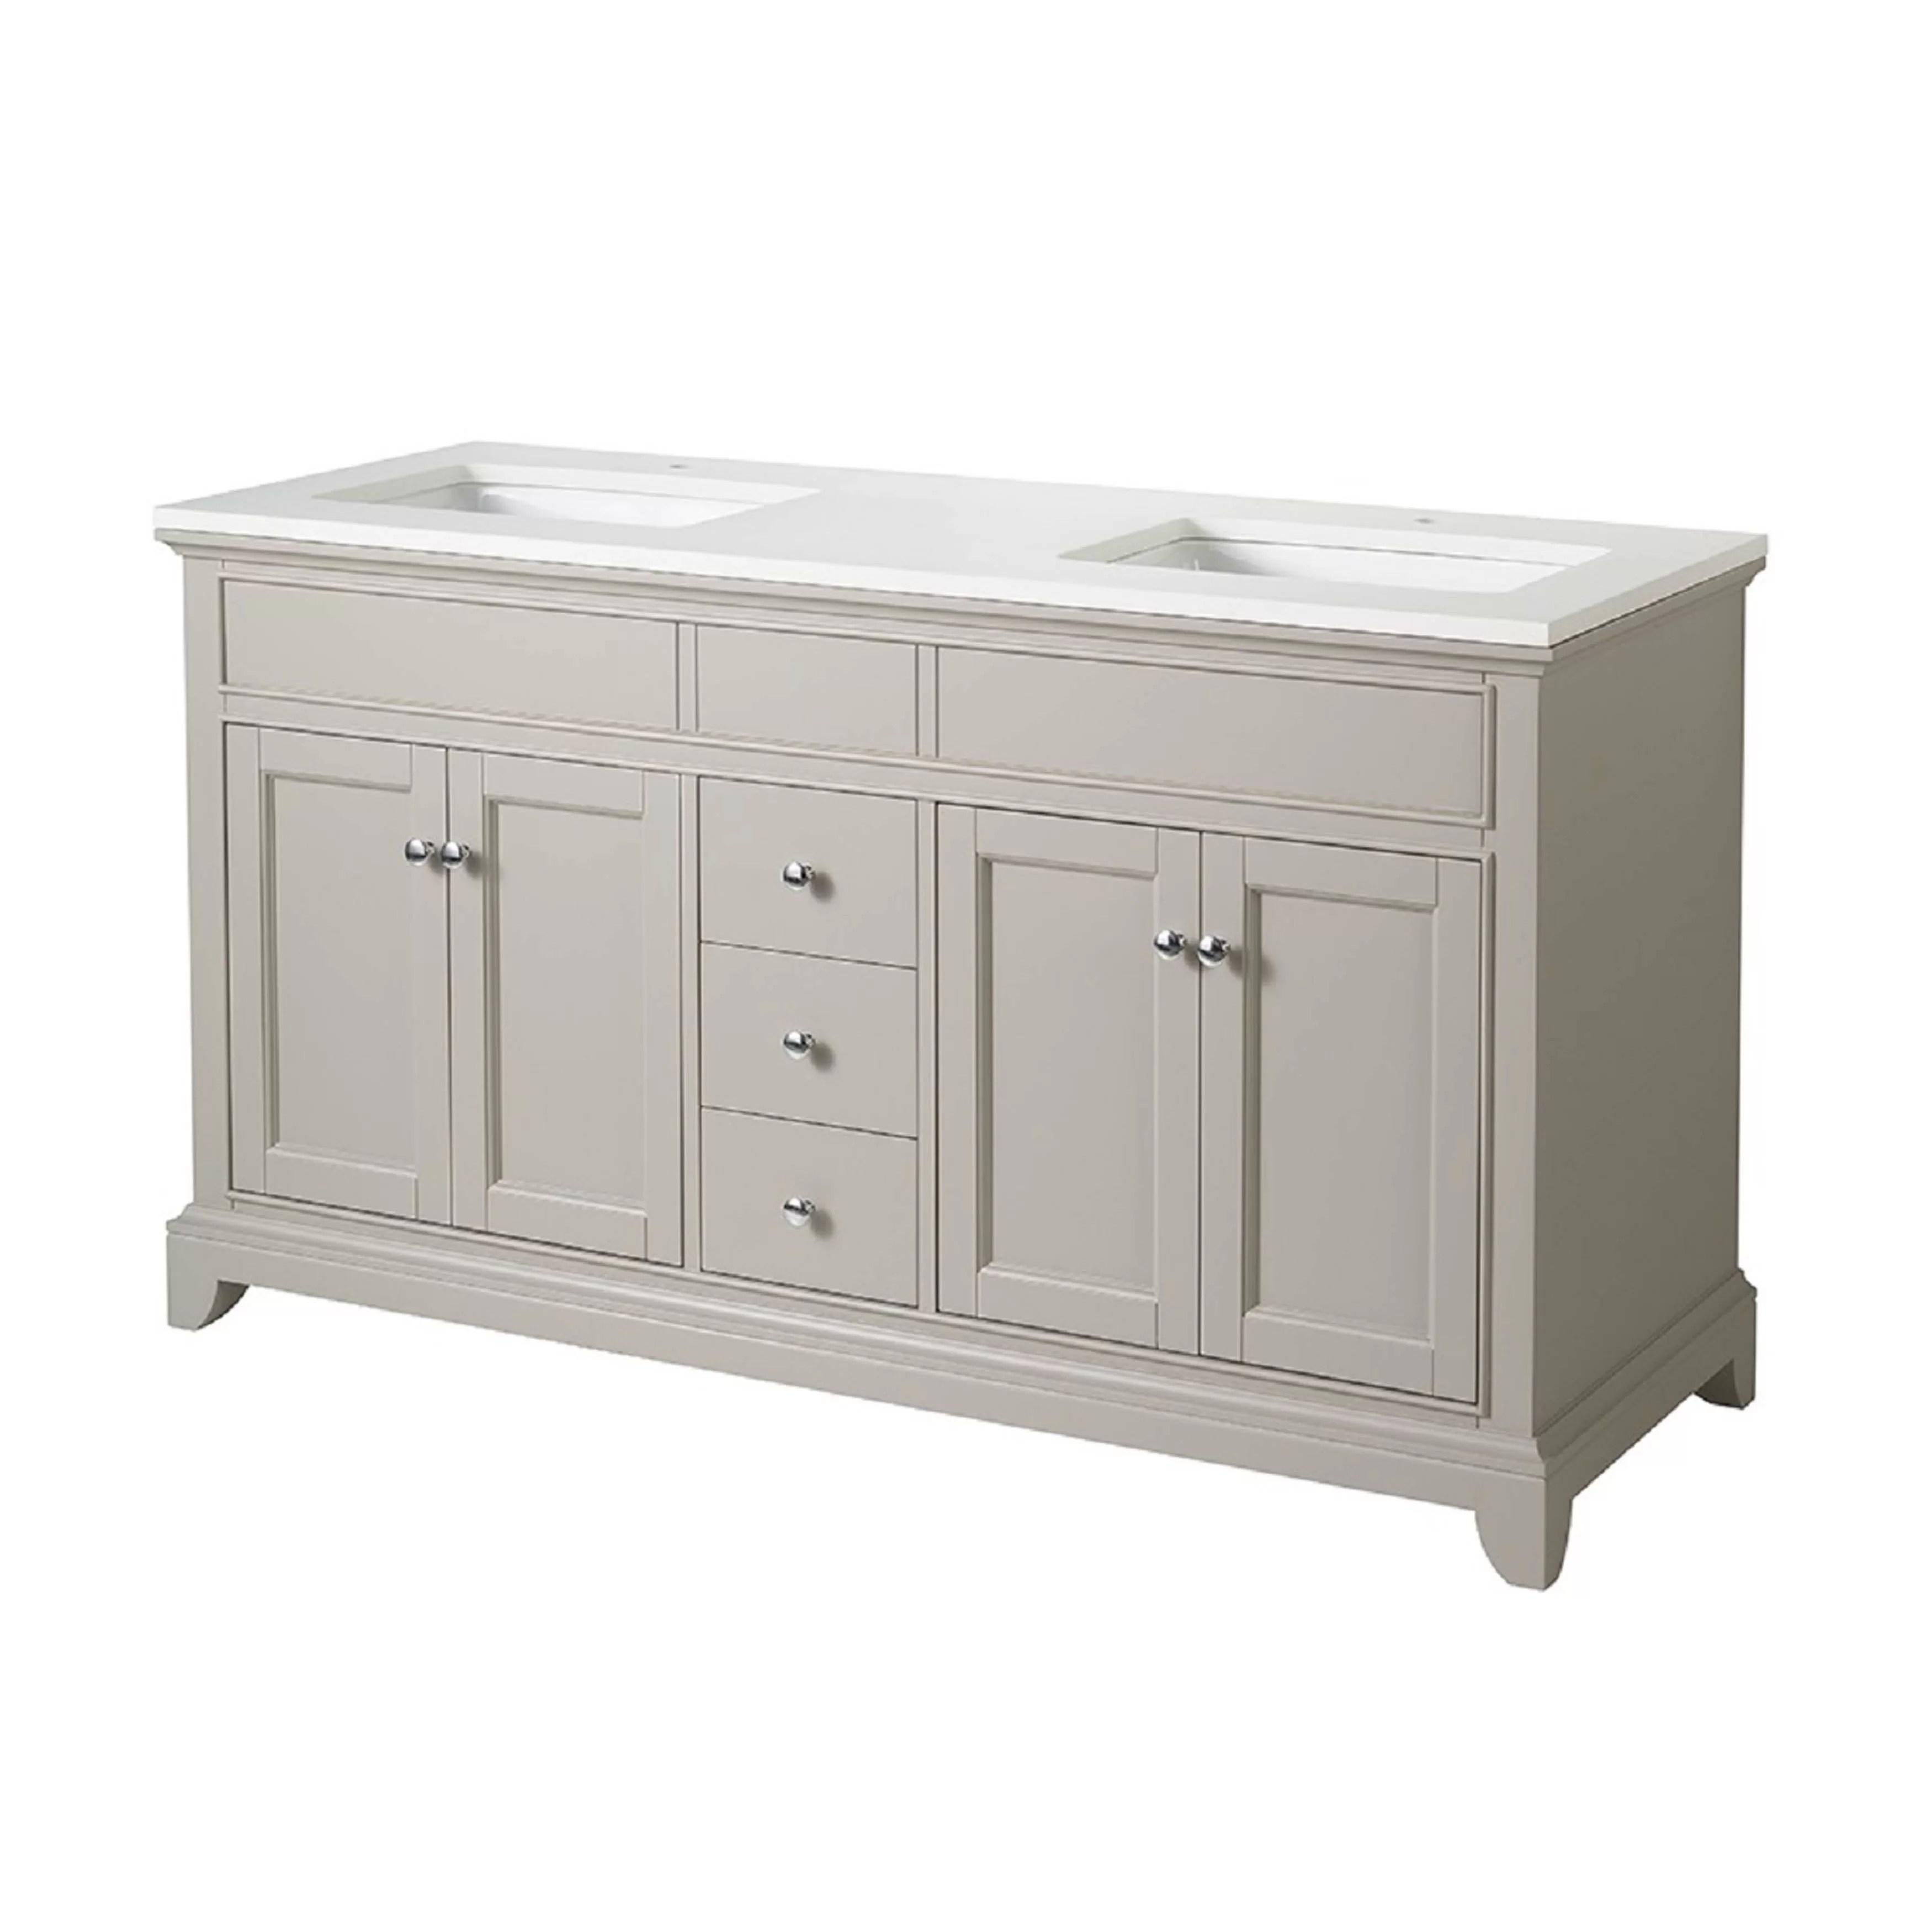 "dCOR design Leola 59"" Double Sink Bathroom Vanity Set"